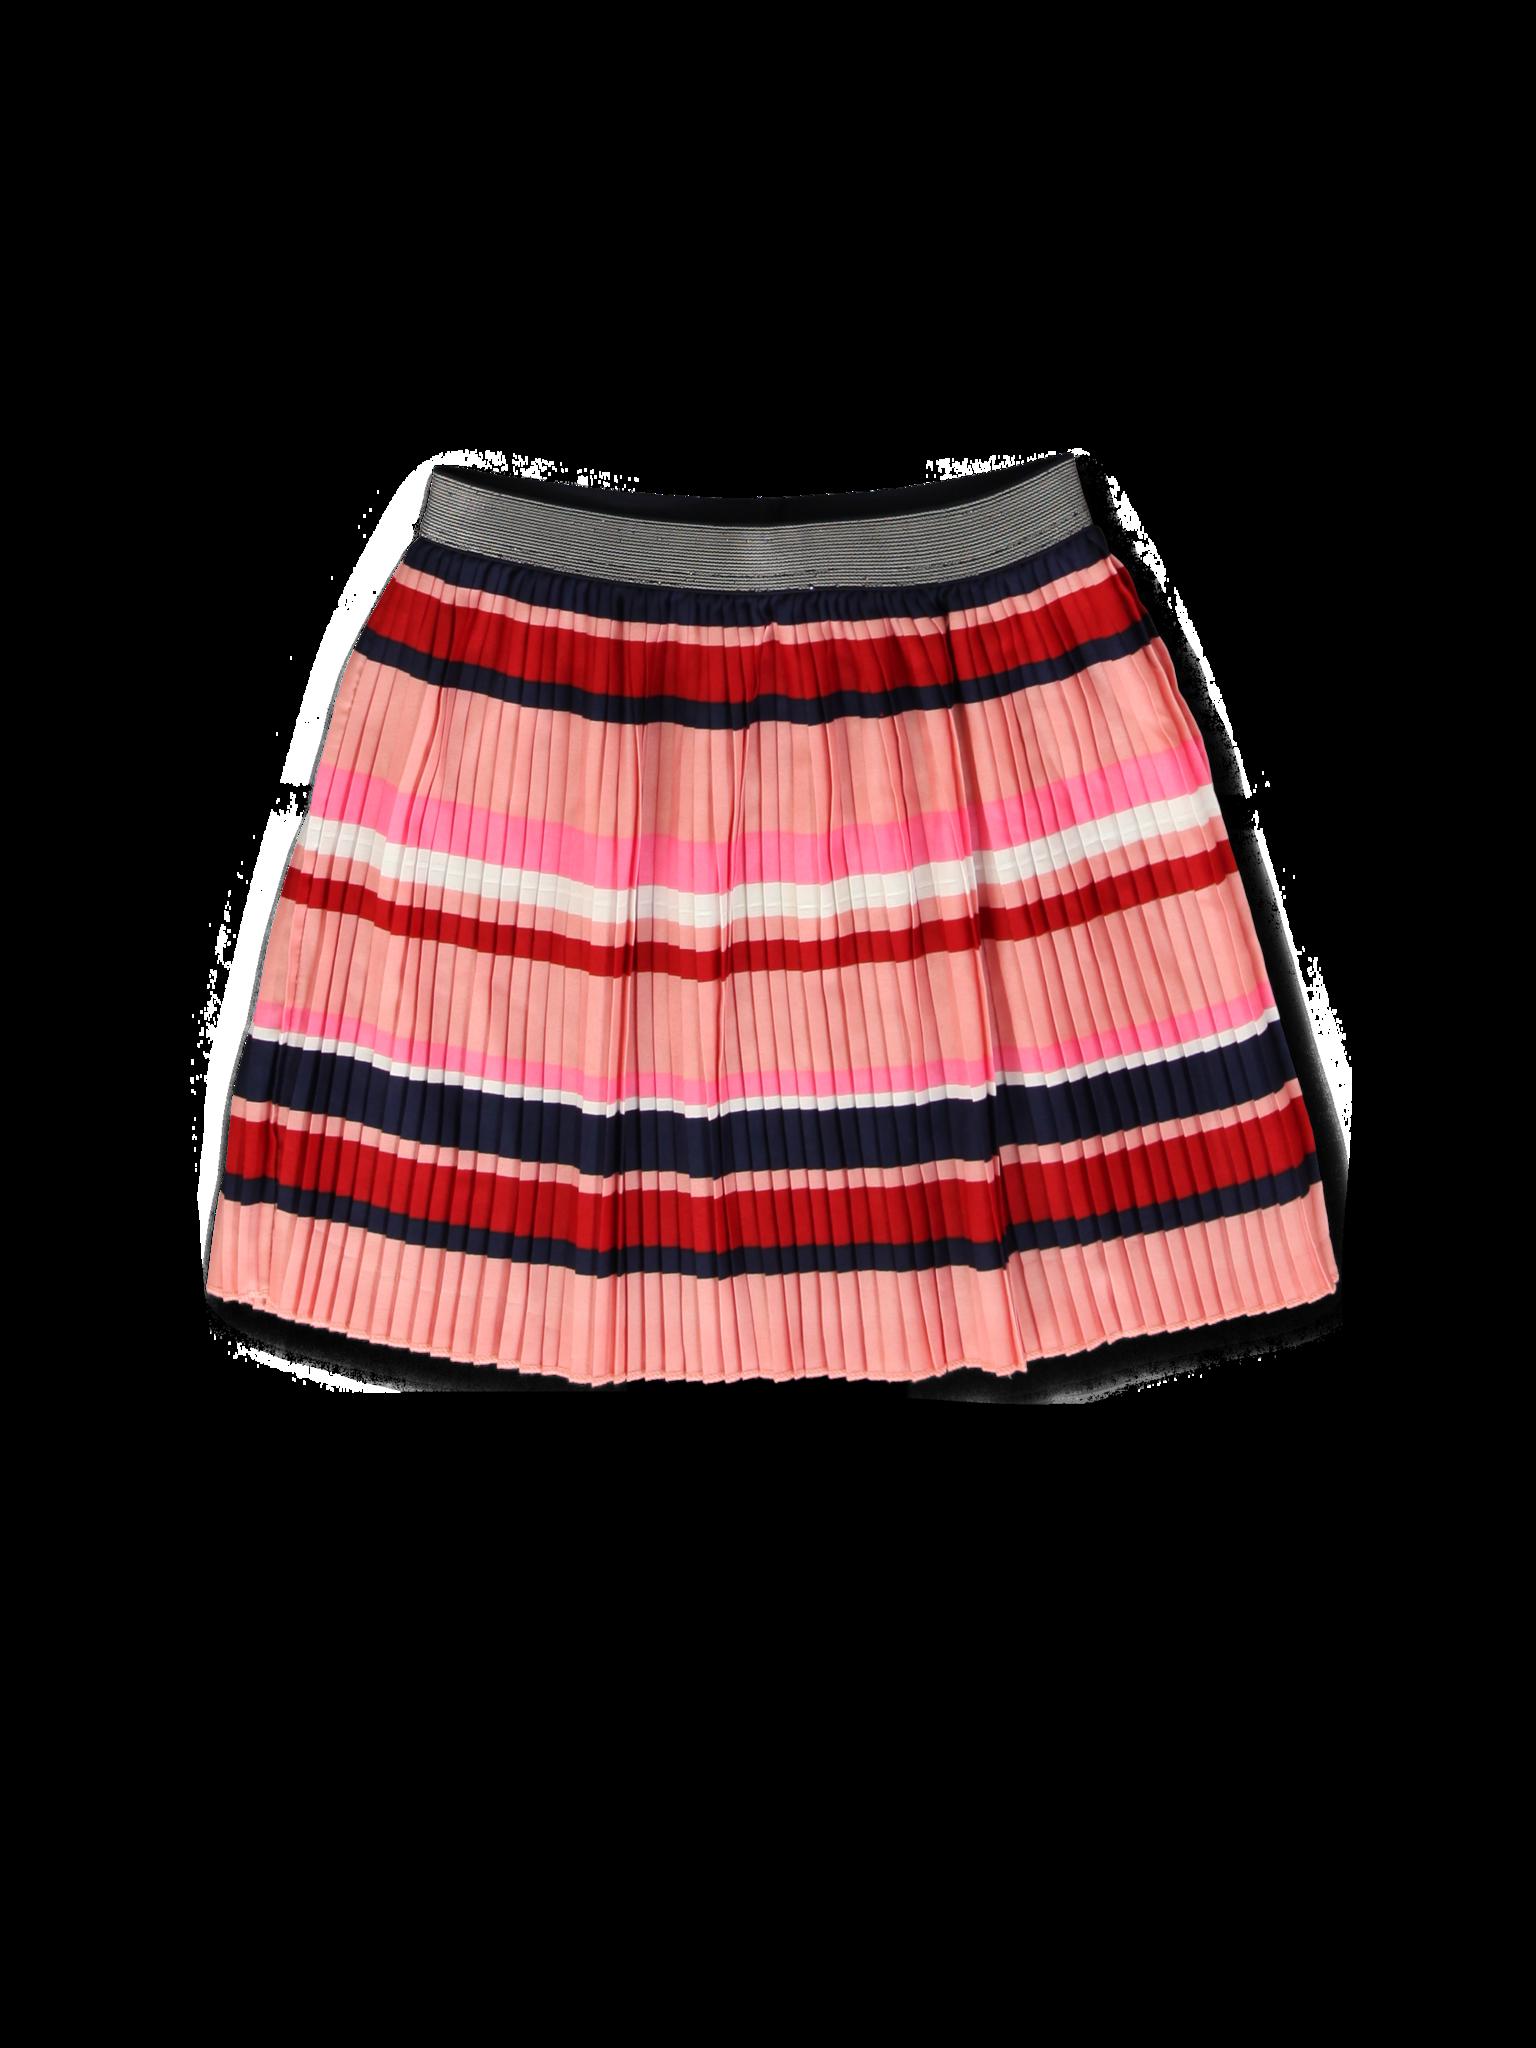 All Brands   Summerproducts Small Girls   Skirt   10 pcs/box